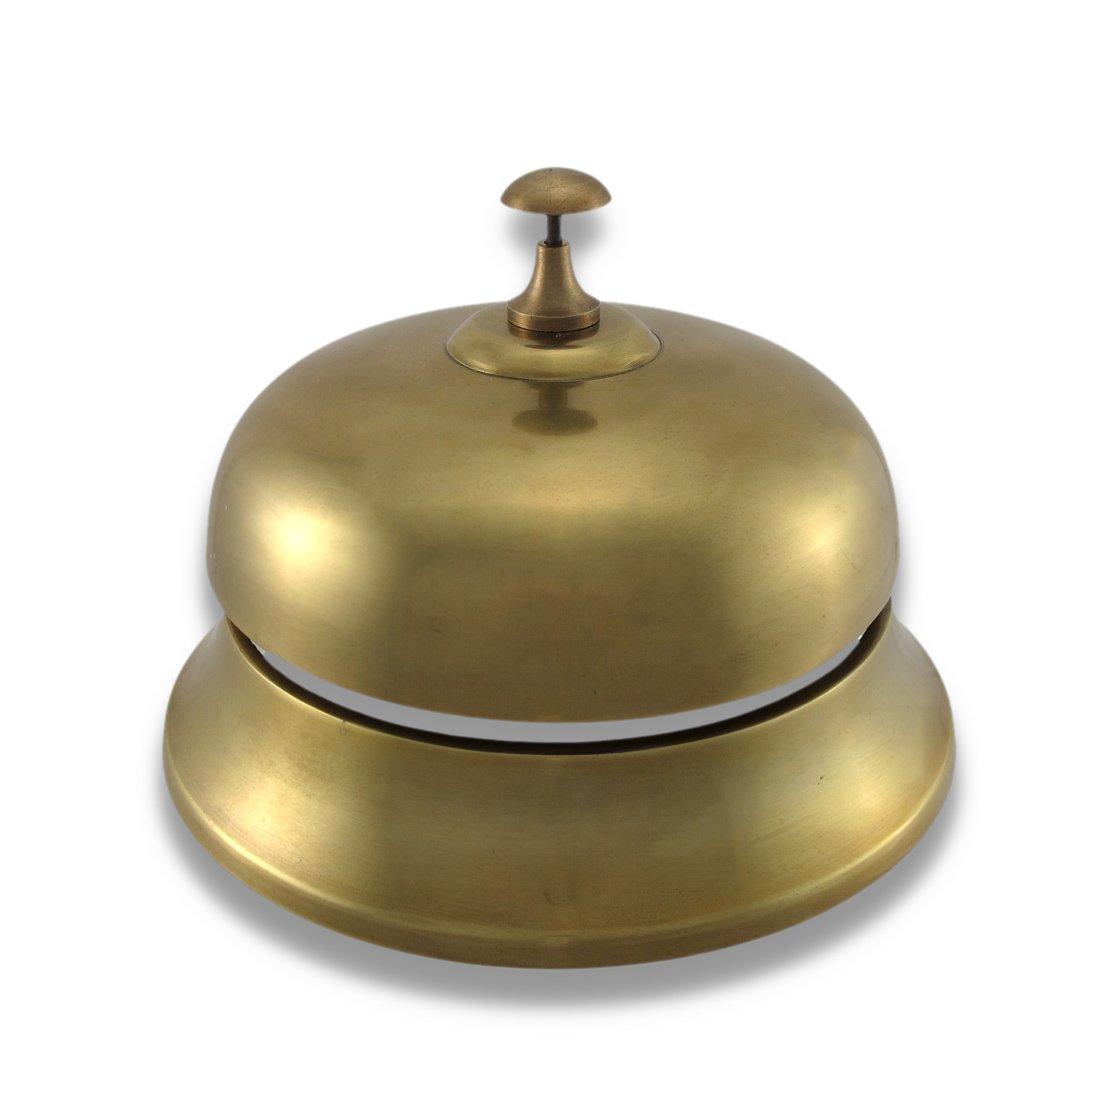 Amazon.com : Oversized Brass Finish Aluminum Desk Bell : Office Desk Call  Bells : Office Products - Amazon.com : Oversized Brass Finish Aluminum Desk Bell : Office